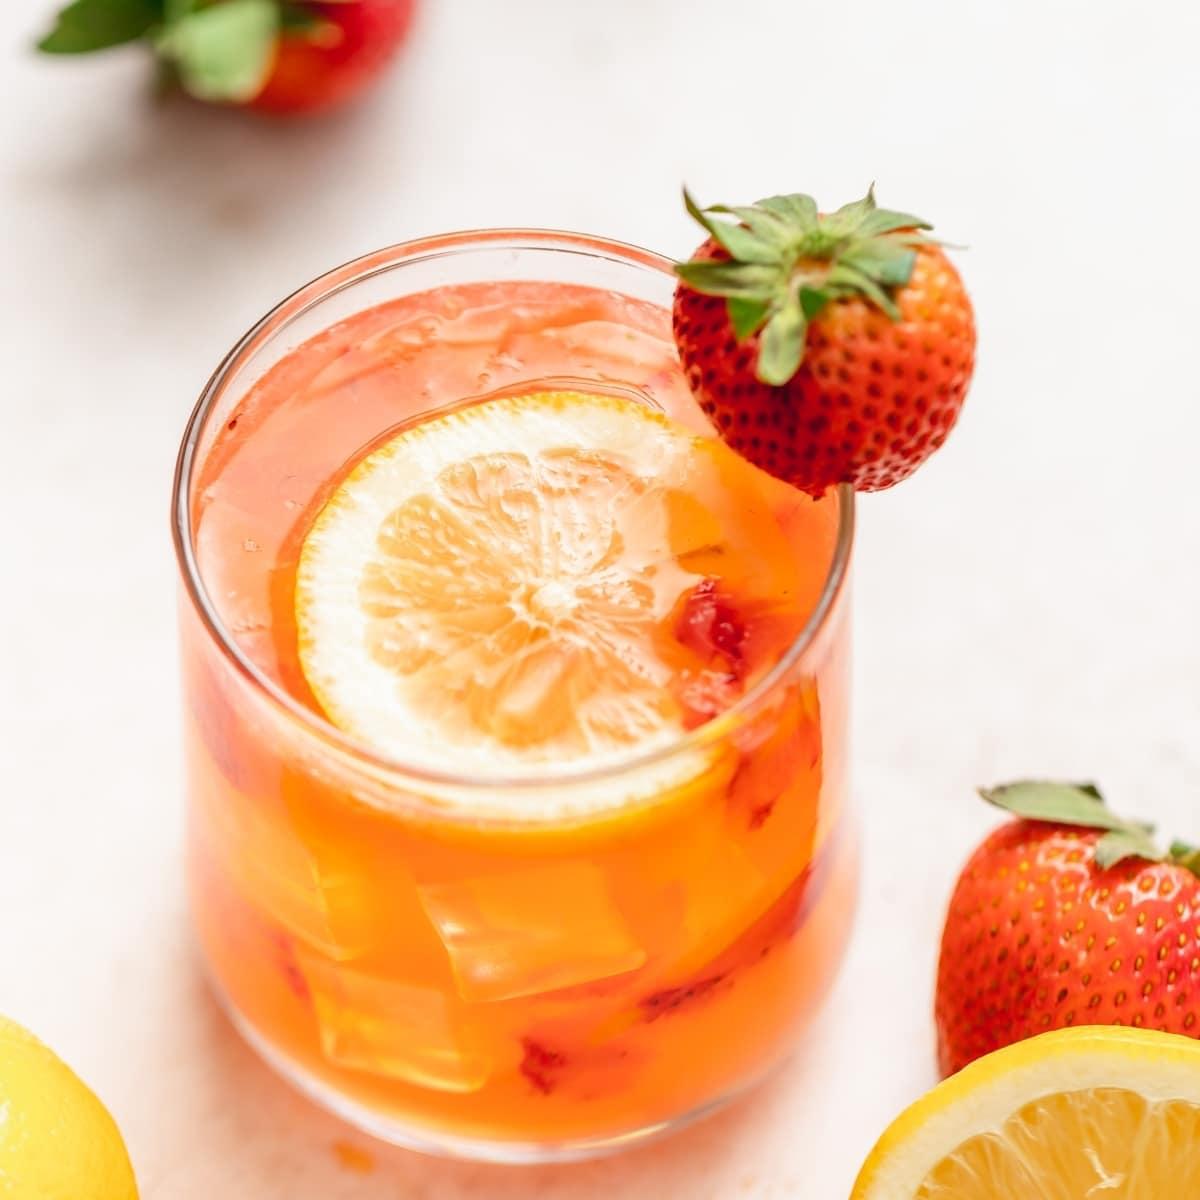 boozy strawberry lemonade with fresh strawberries